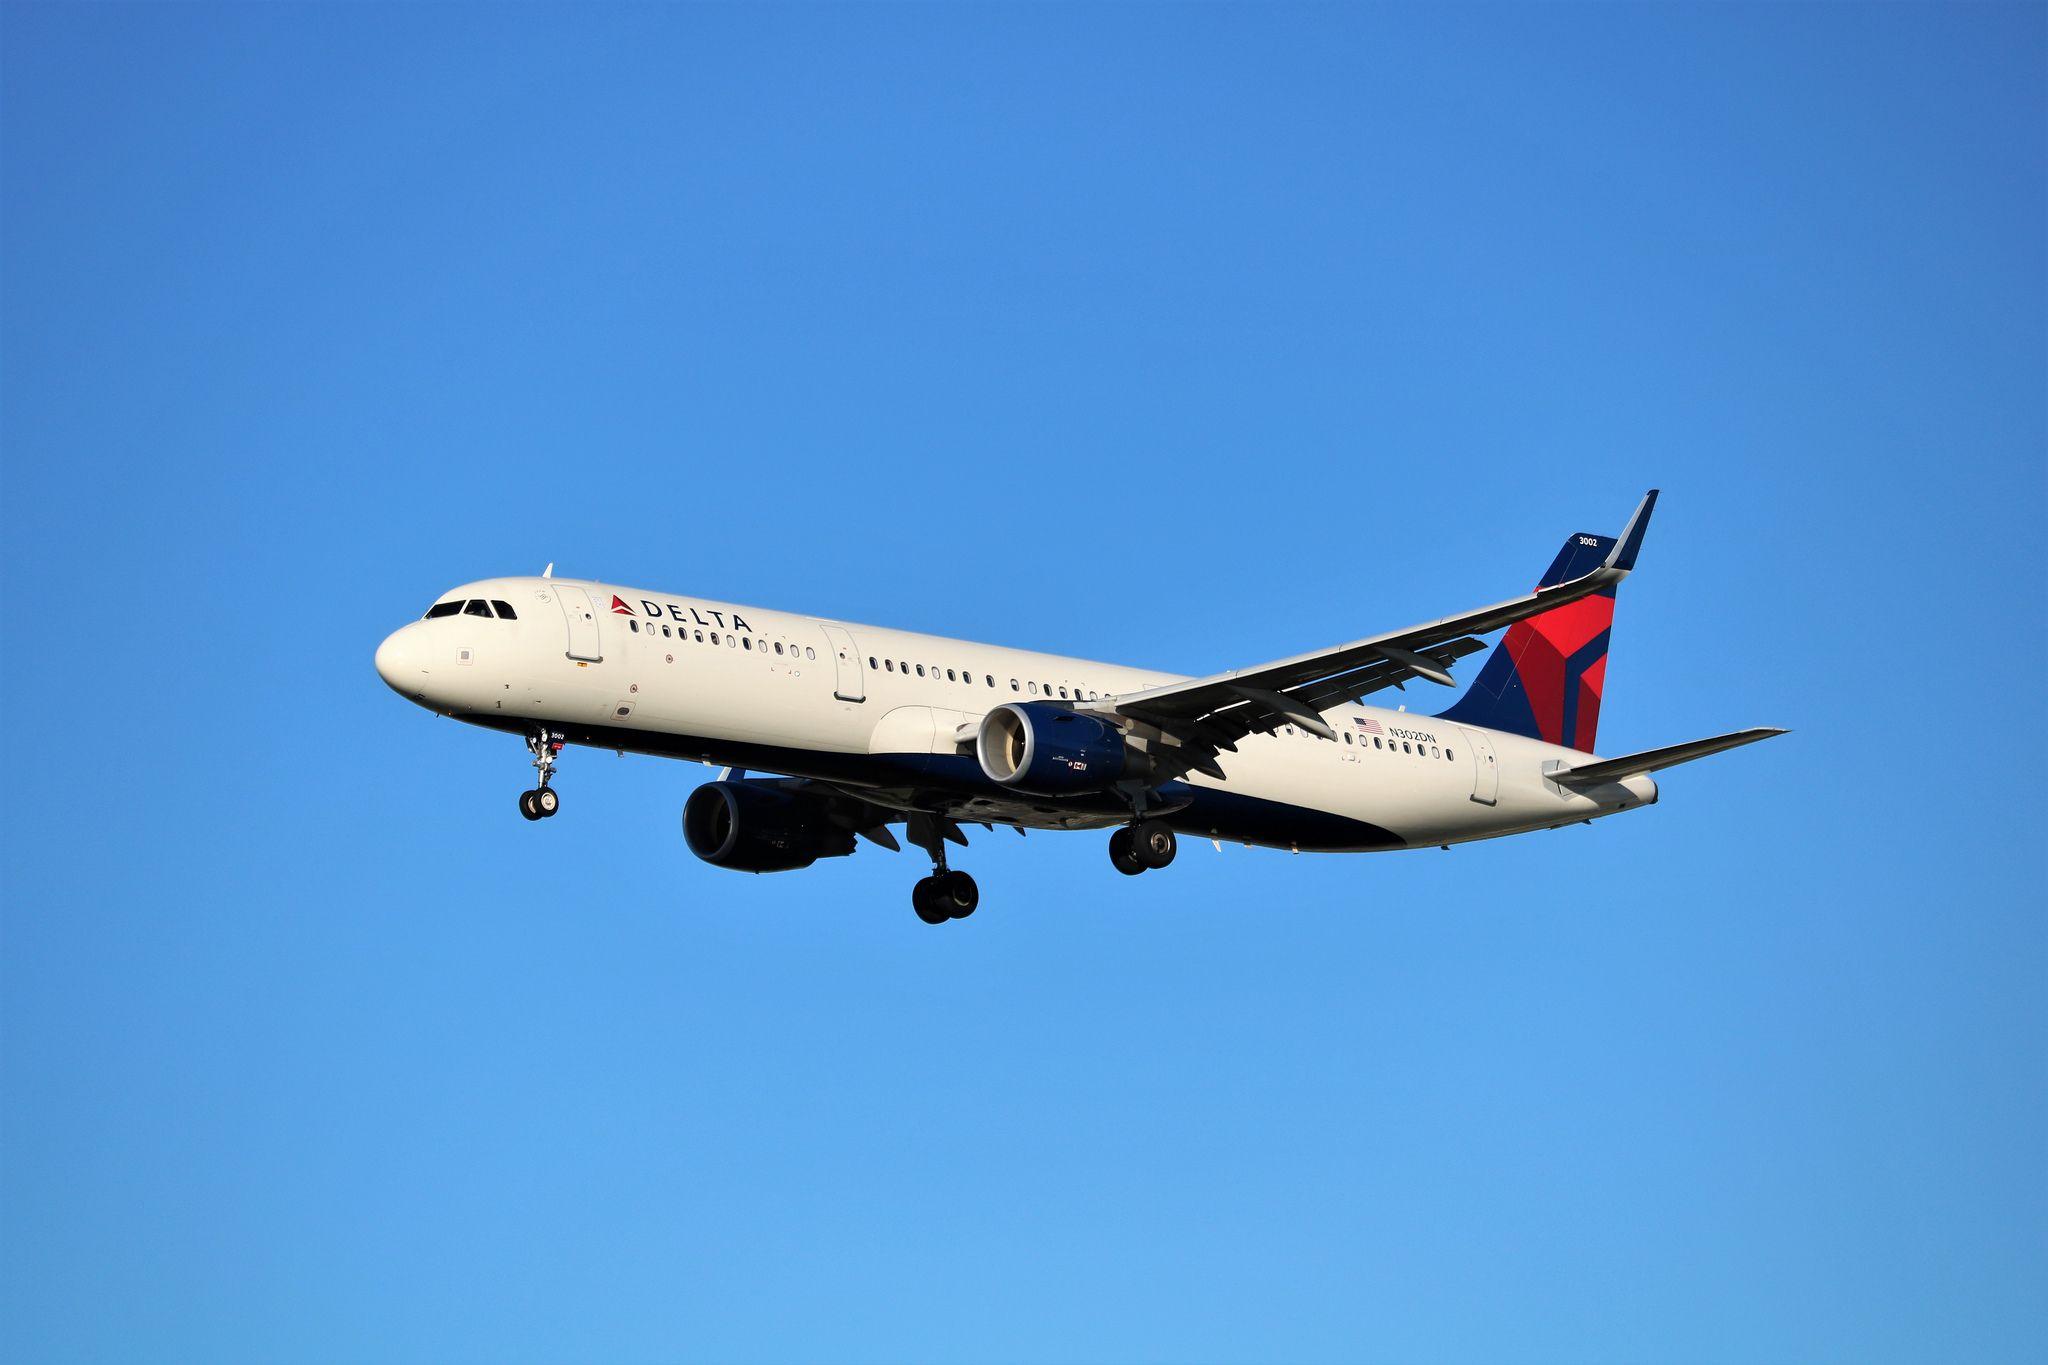 Delta Air Lines A321 Delta airlines, Delta, Airline